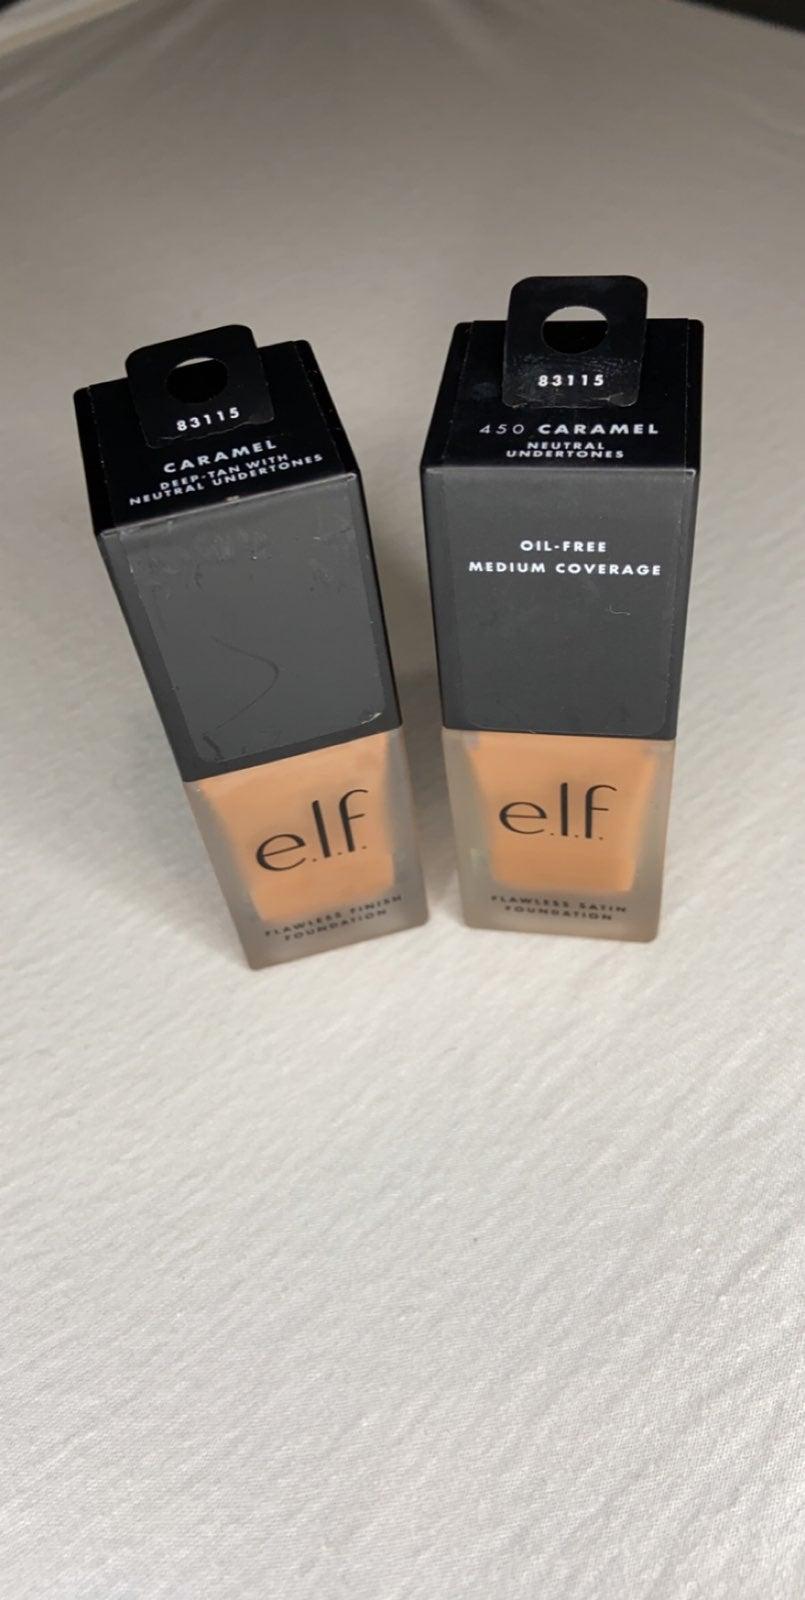 elf makeup 450 Caramel oil free 2 pack